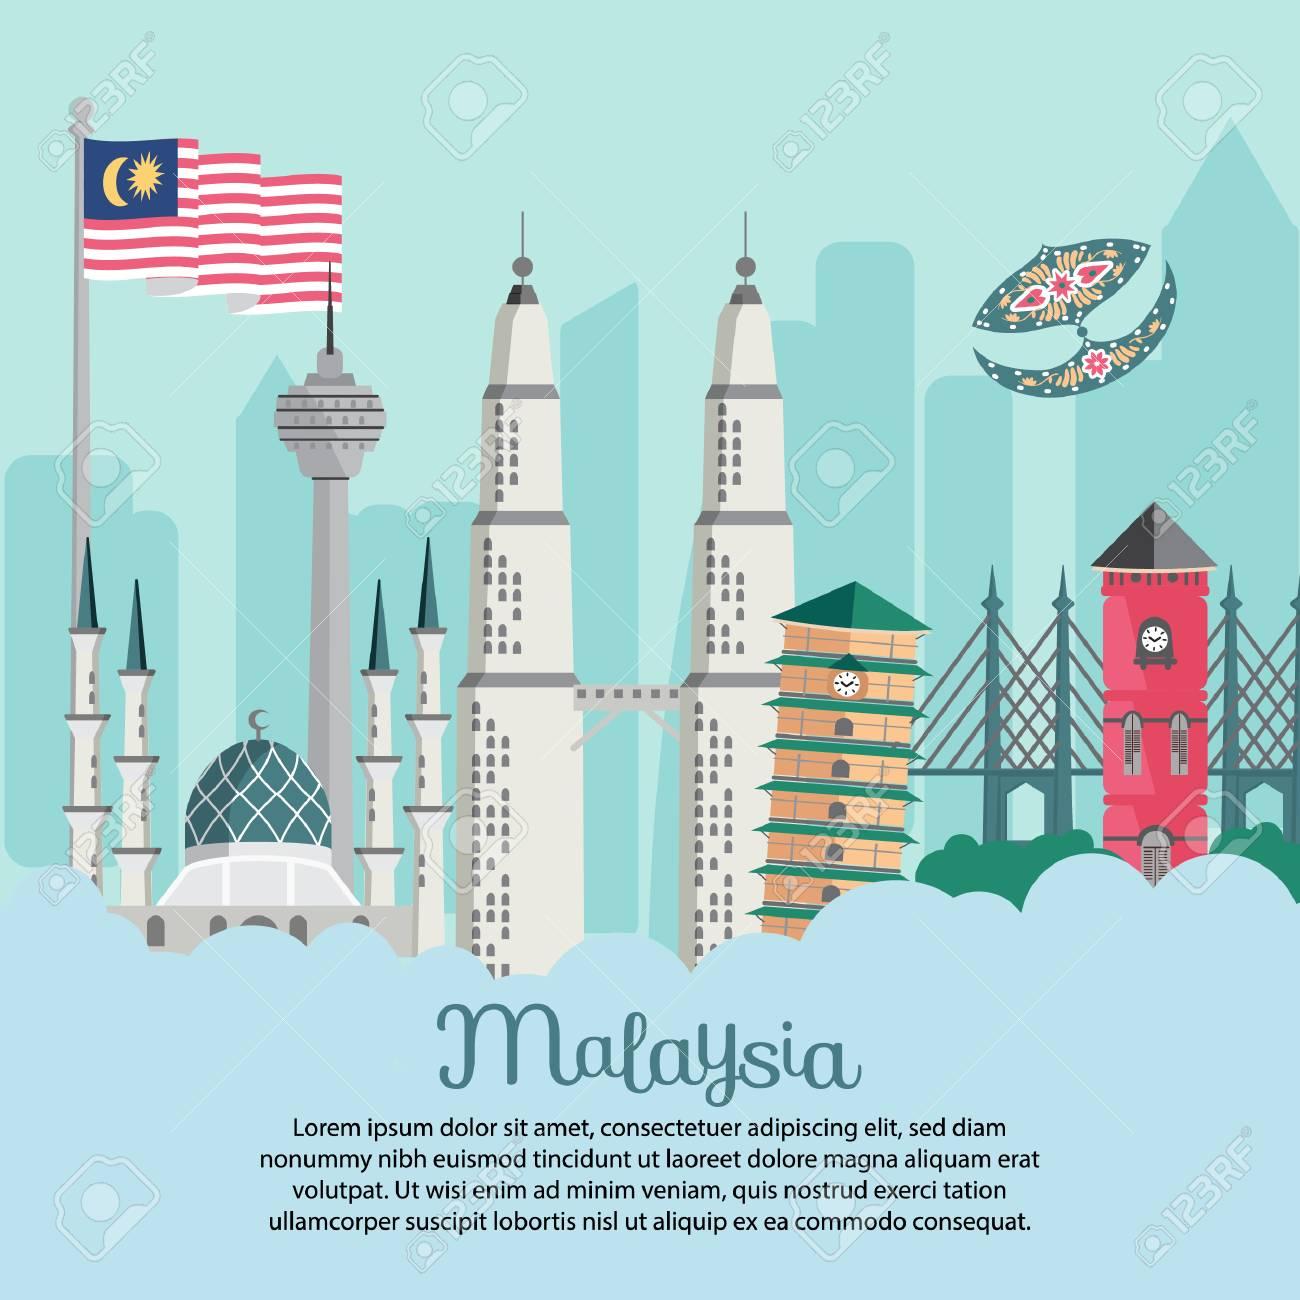 Malaysia building - Flag bendera berkibar masjid shah alam leaning tower KLCC merdeka - 116142274